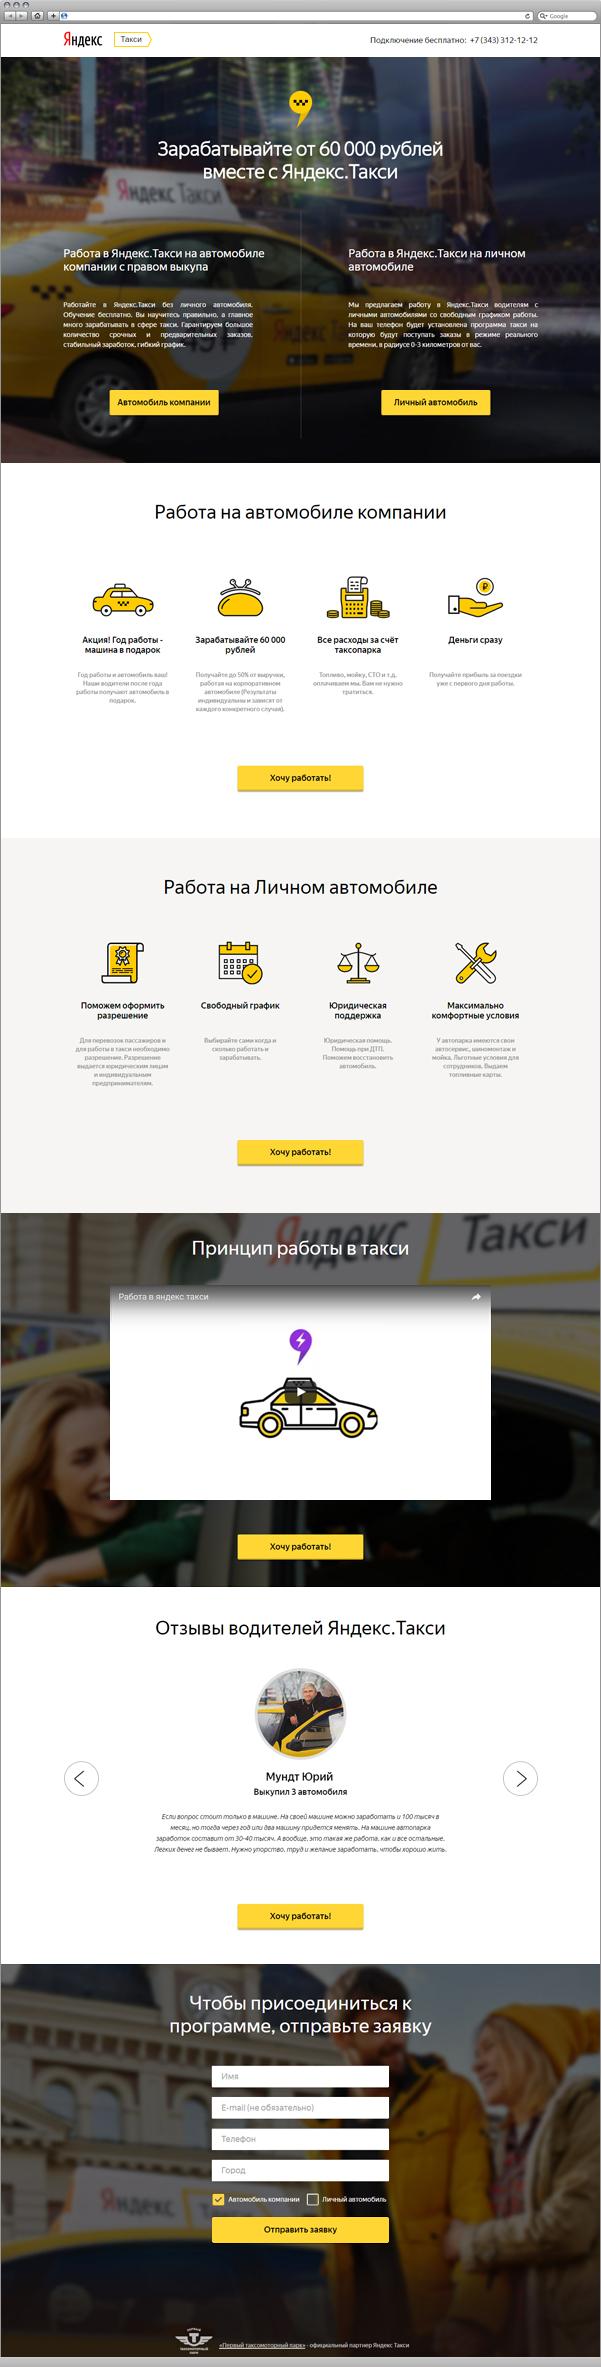 Заказ такси в Москве от 12 руб  минута тел 7430000